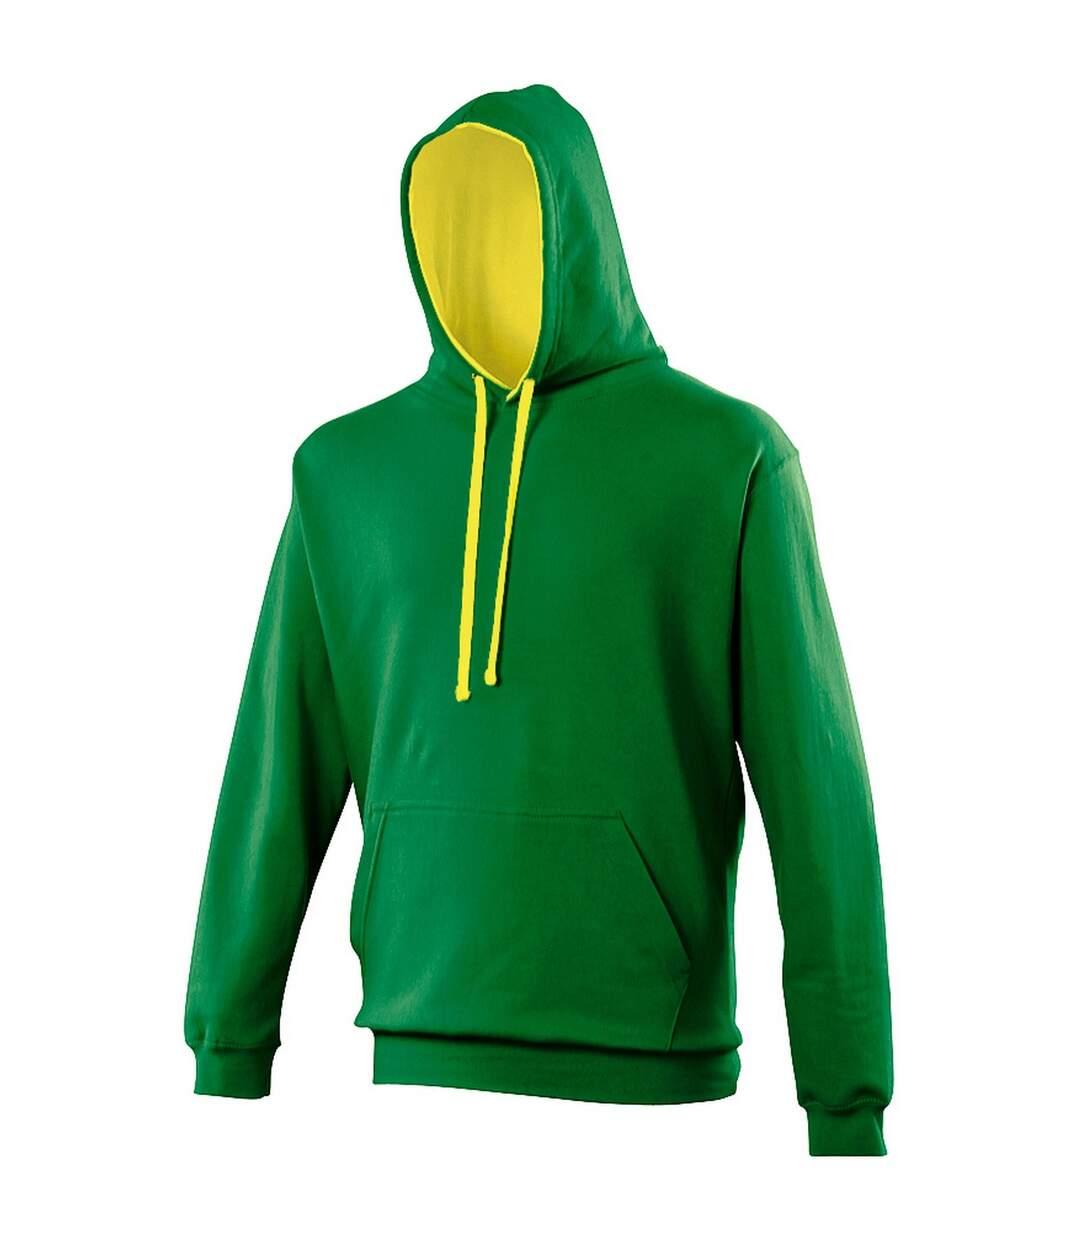 Awdis Varsity Hooded Sweatshirt / Hoodie (Royal / Sun Yellow) - UTRW165